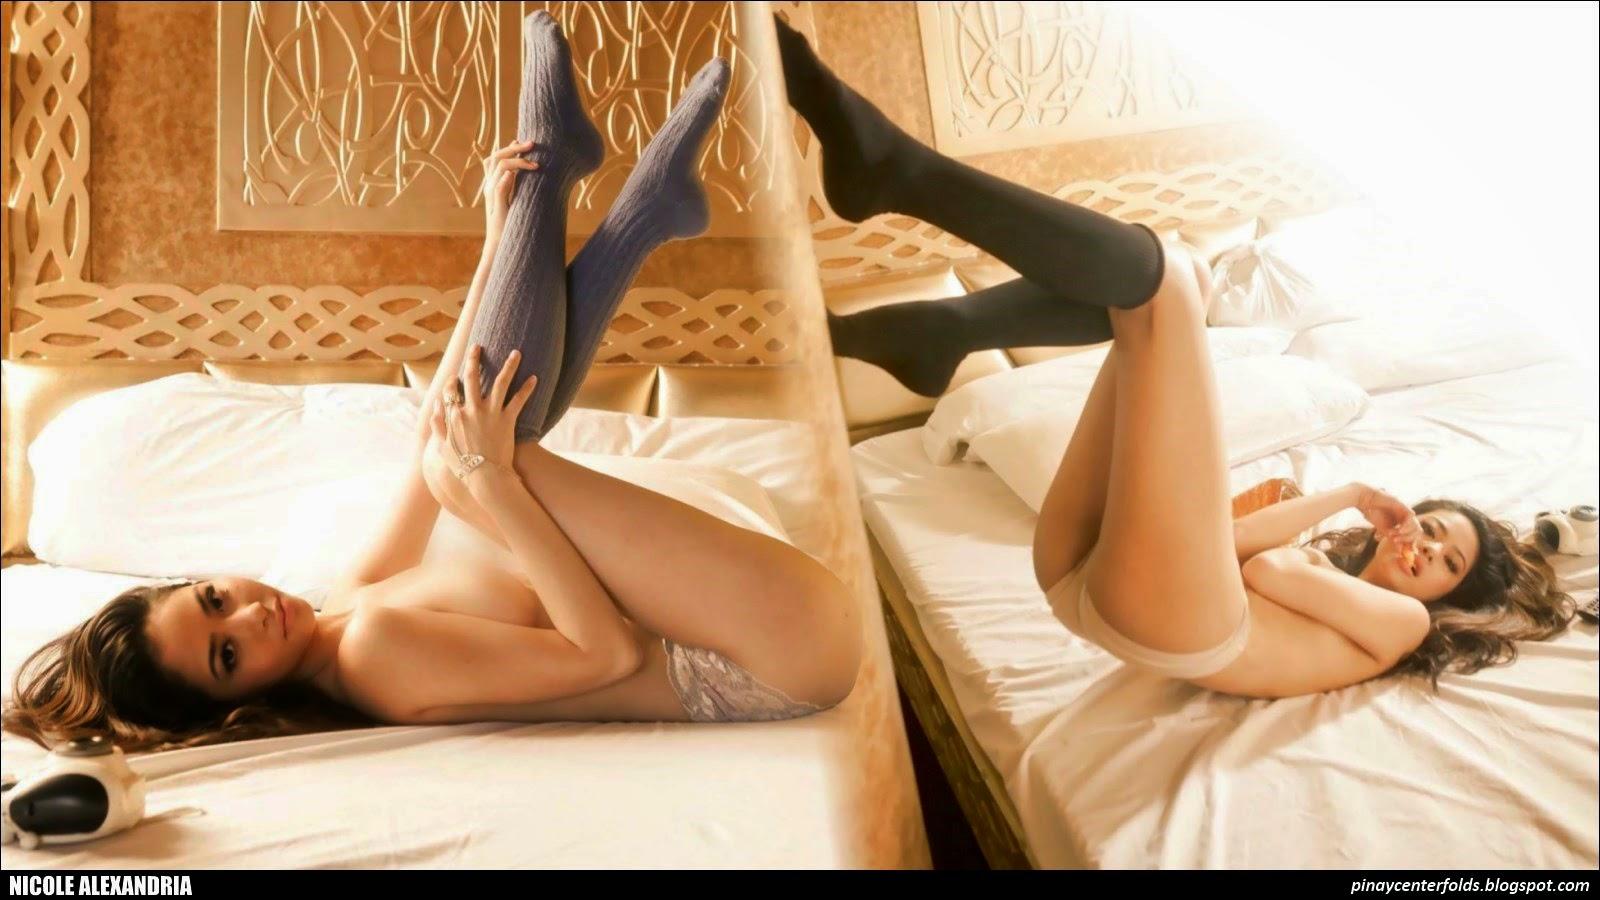 Nicole Alexandria In FHM 2